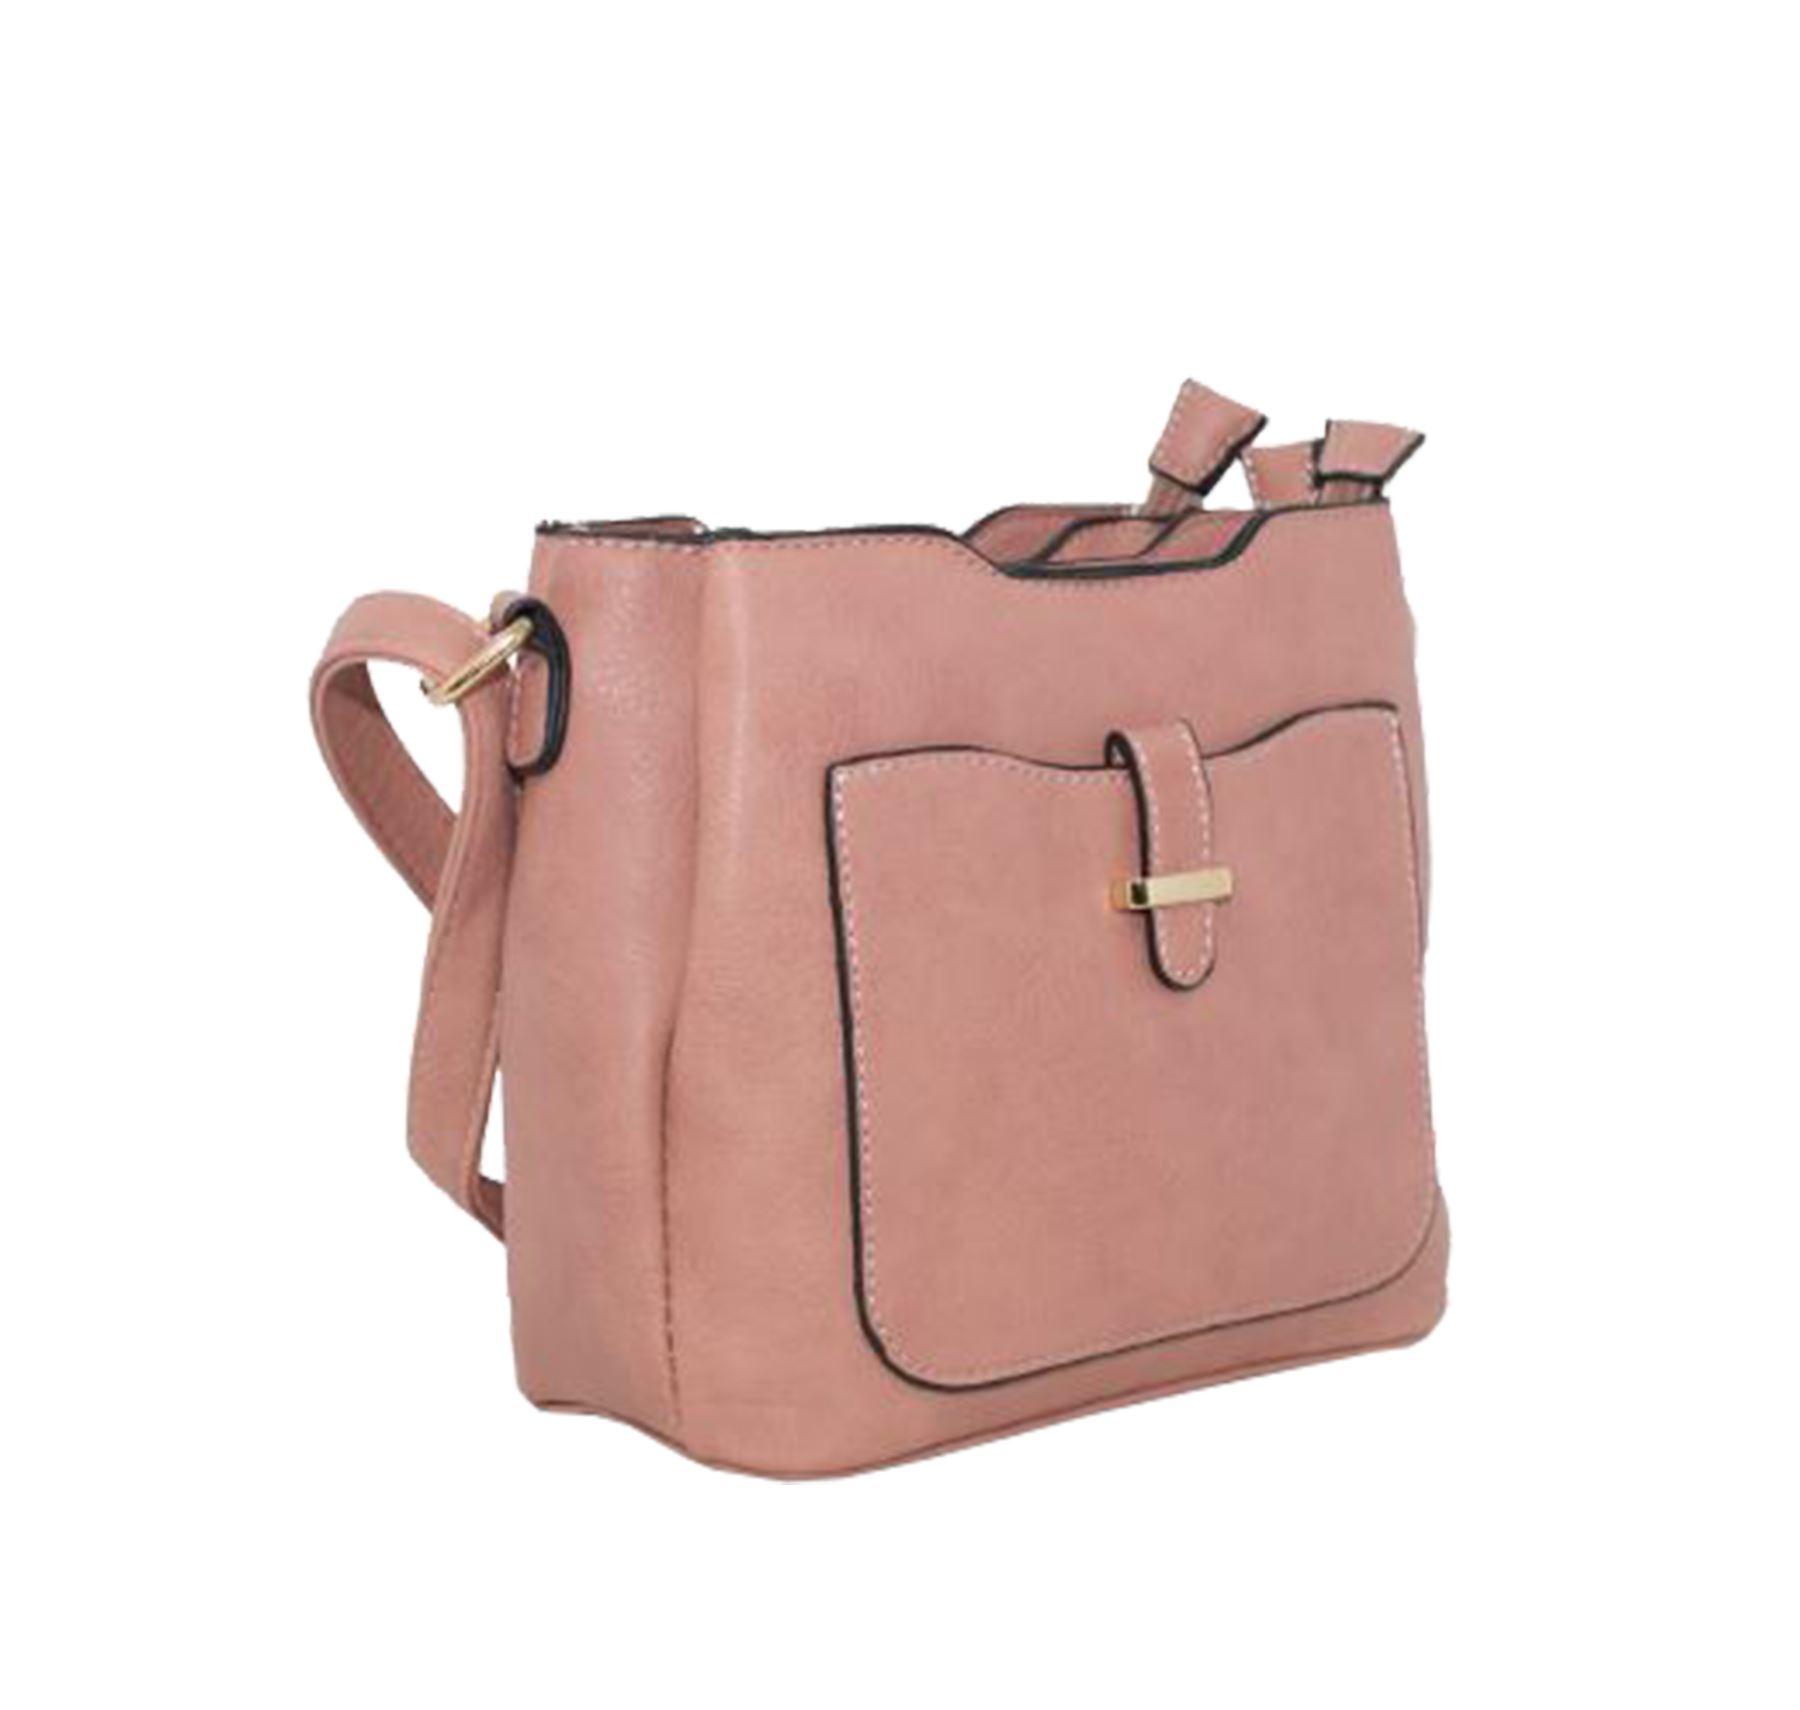 New Ladies Triple Compartments Faux Leather Chic Crossbody Bag Handbag